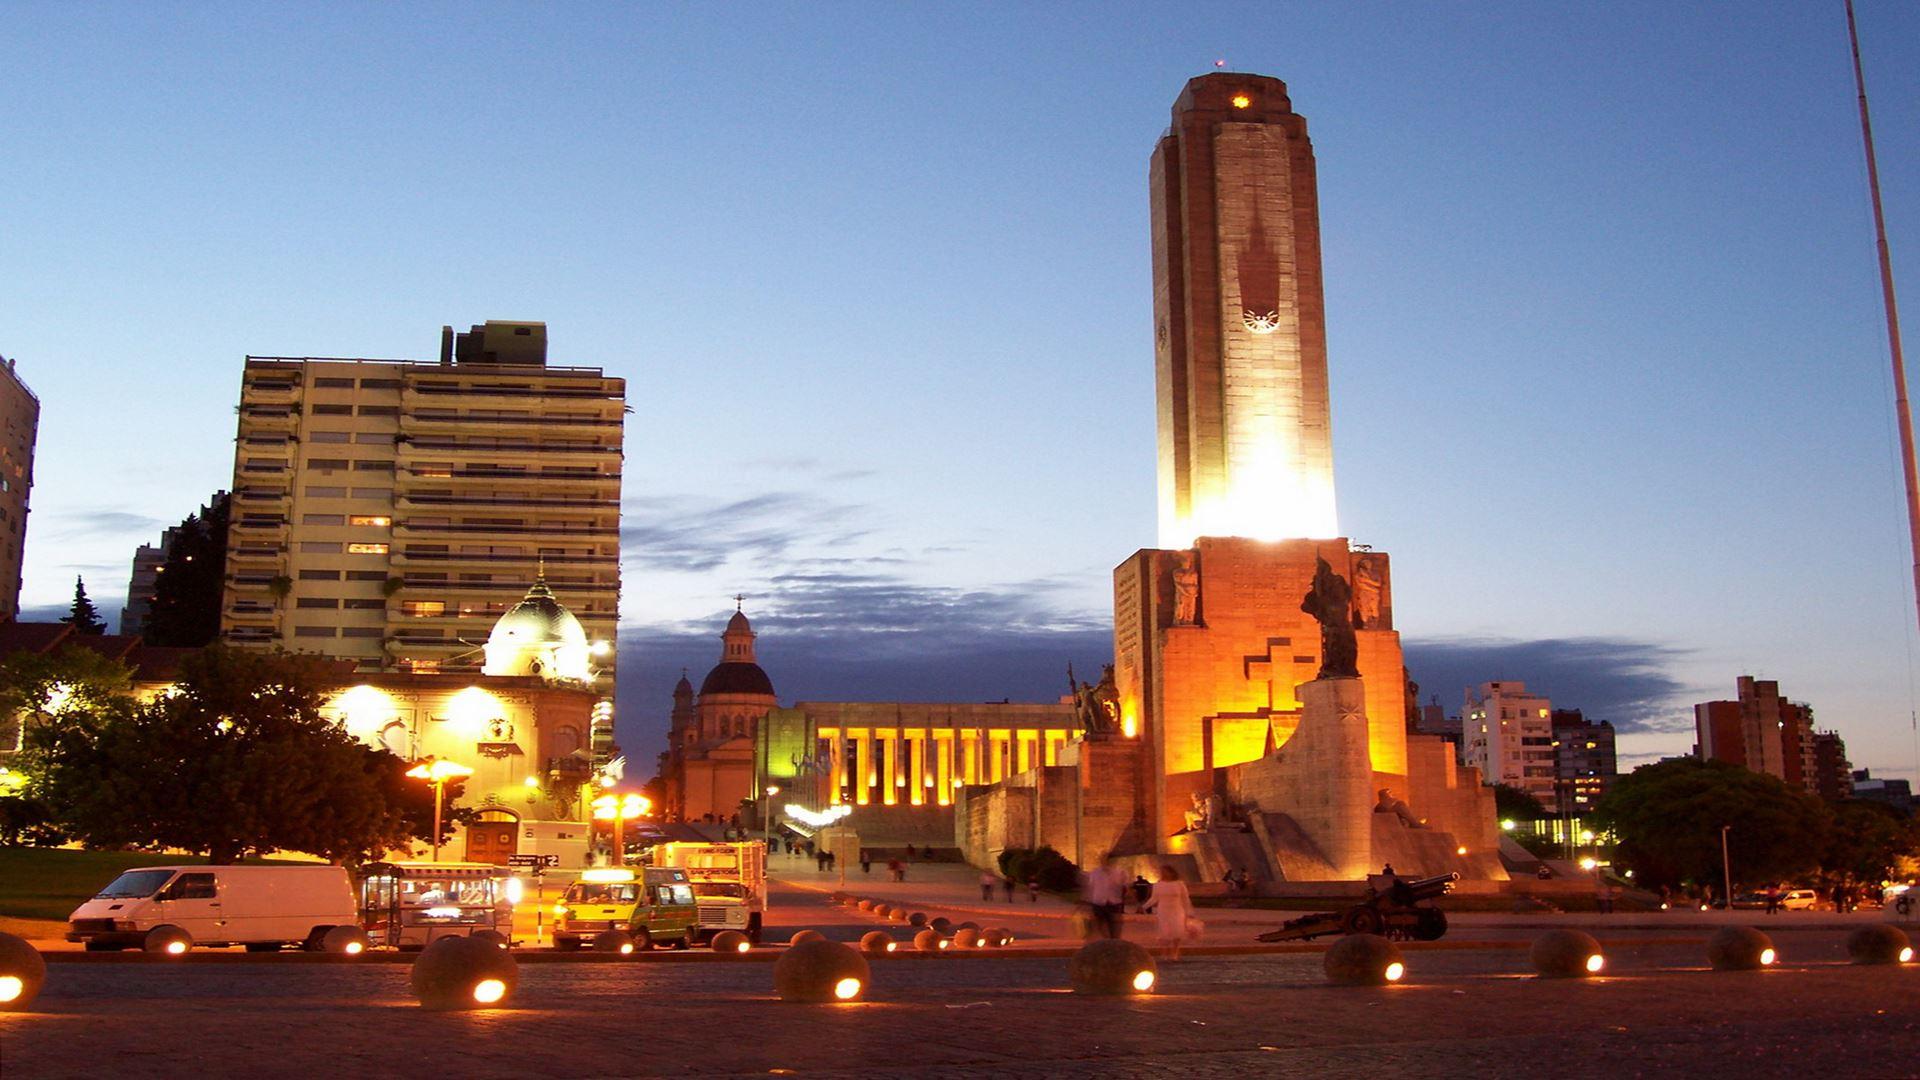 CITY TOUR PRIVADO DE MEDIO DIA EN ROSARIO